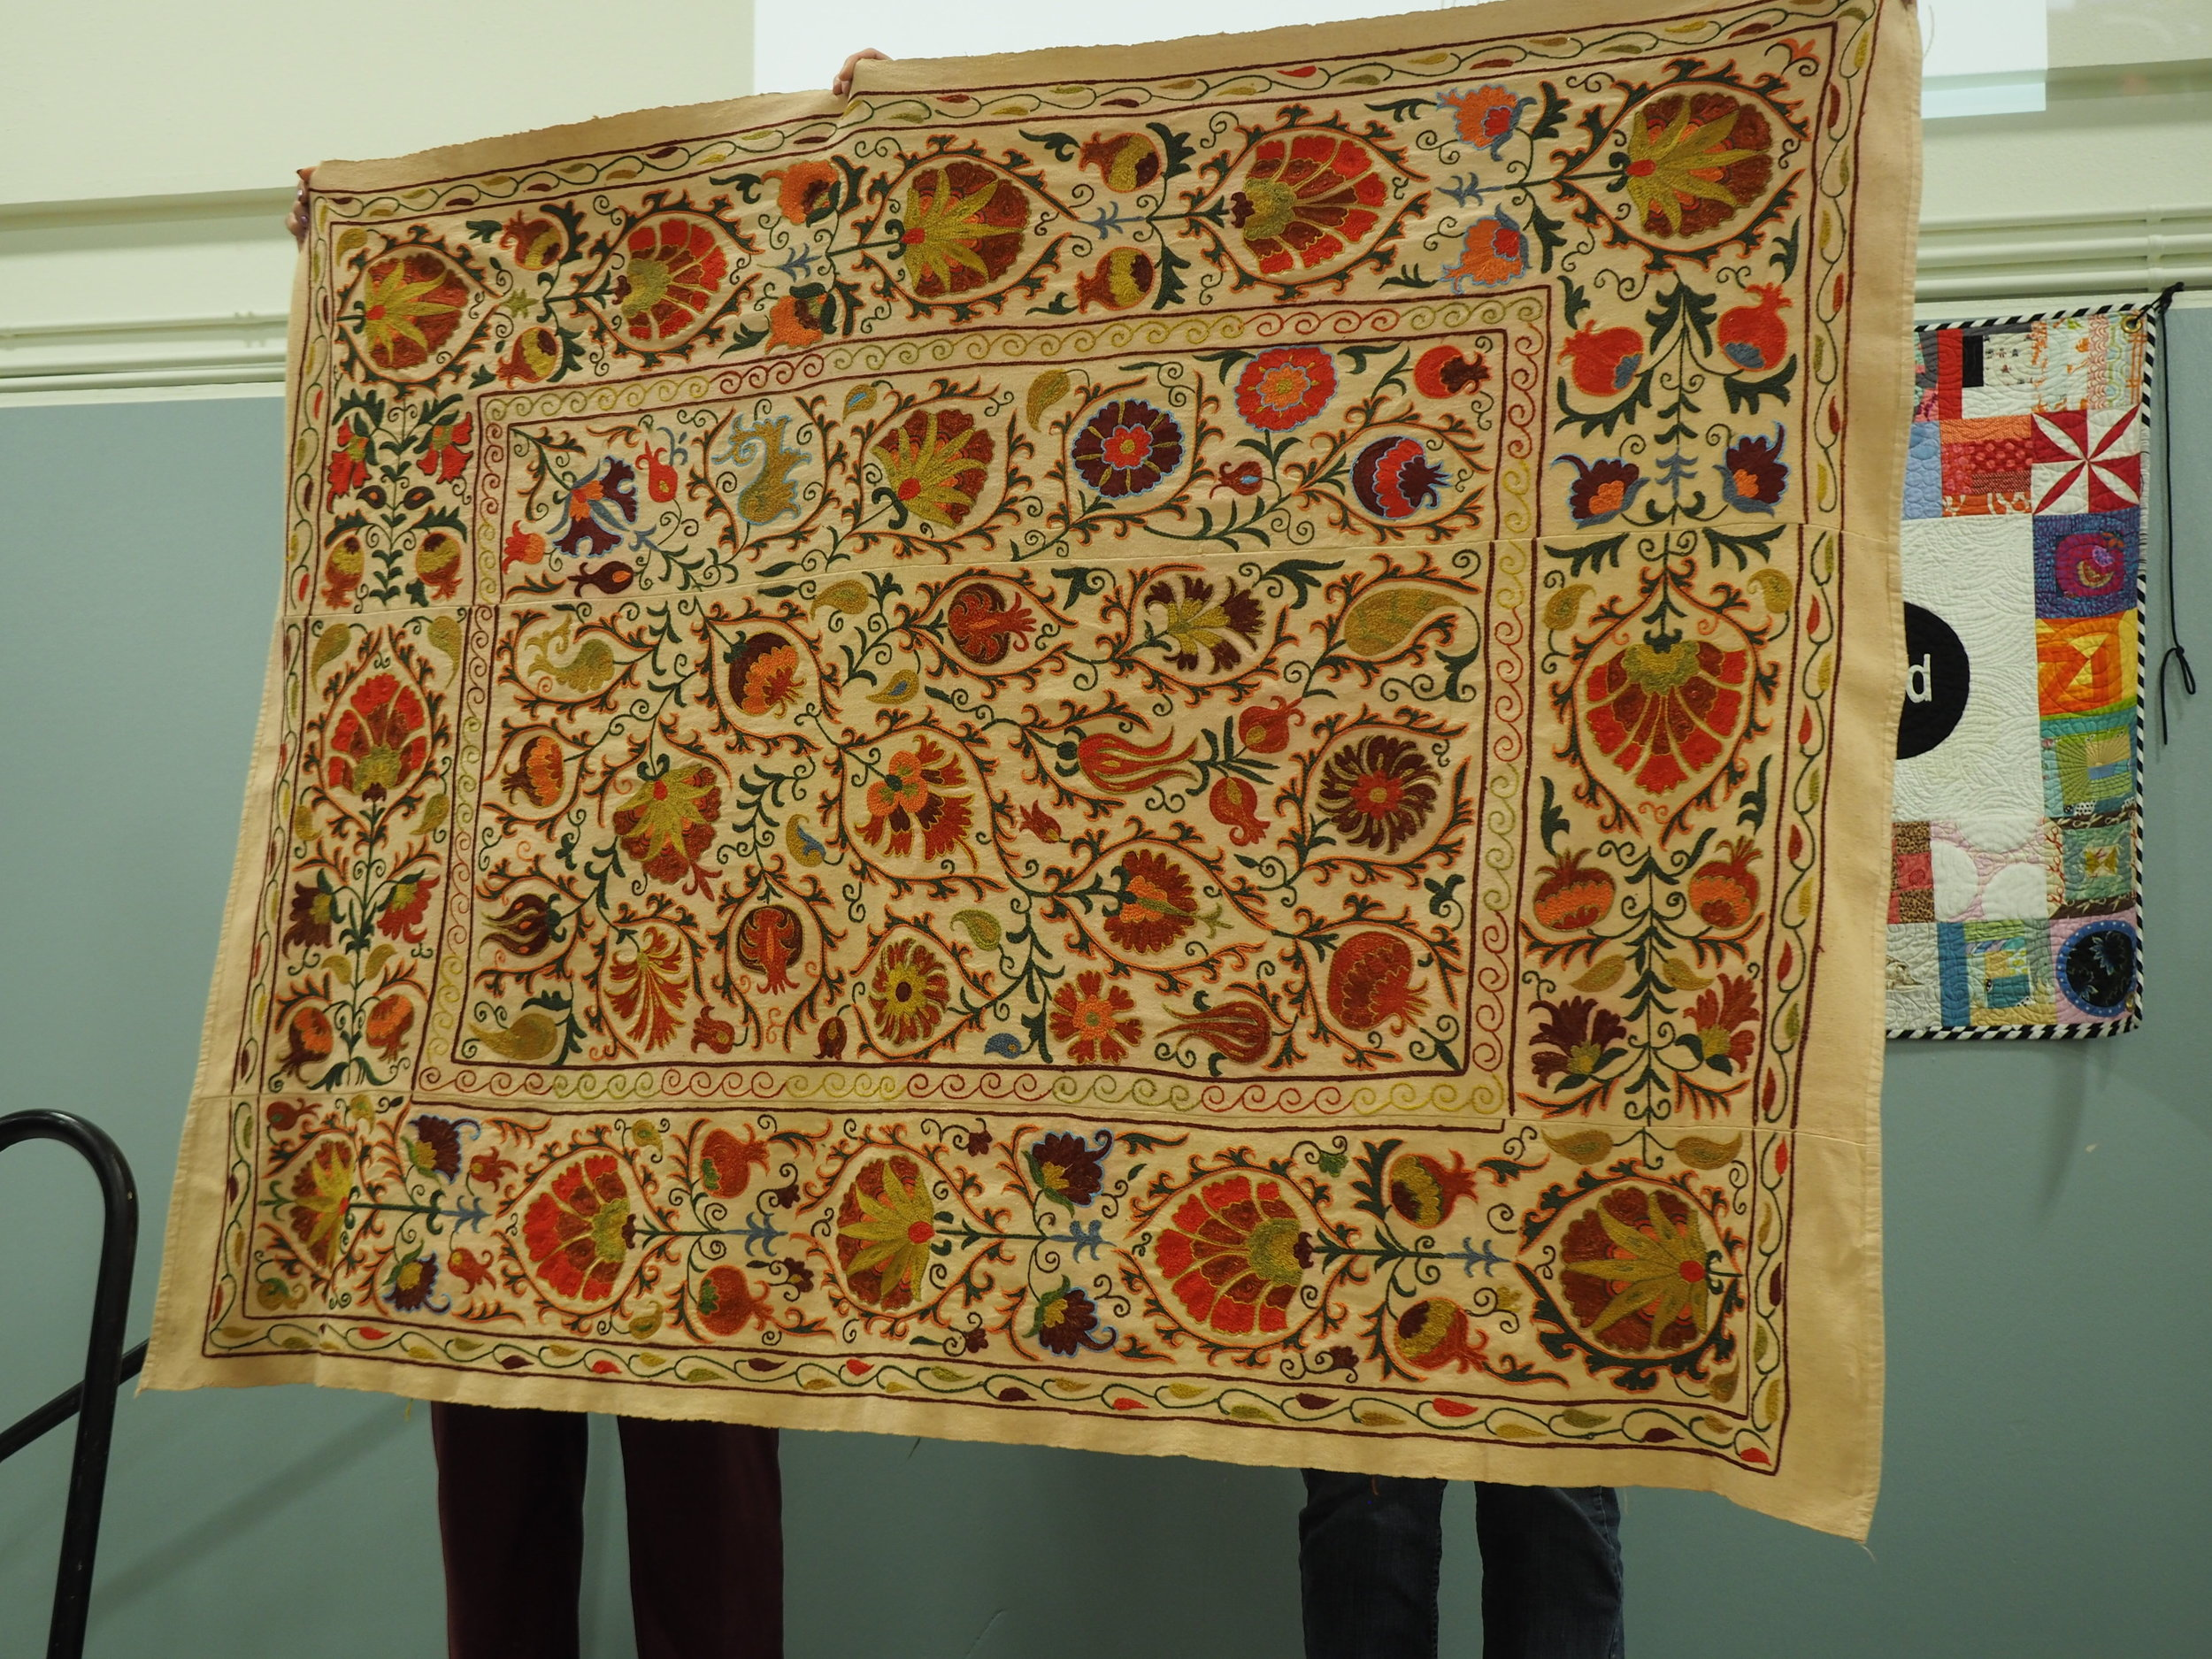 Uzbekistan Suzani presented by Nancy Watts